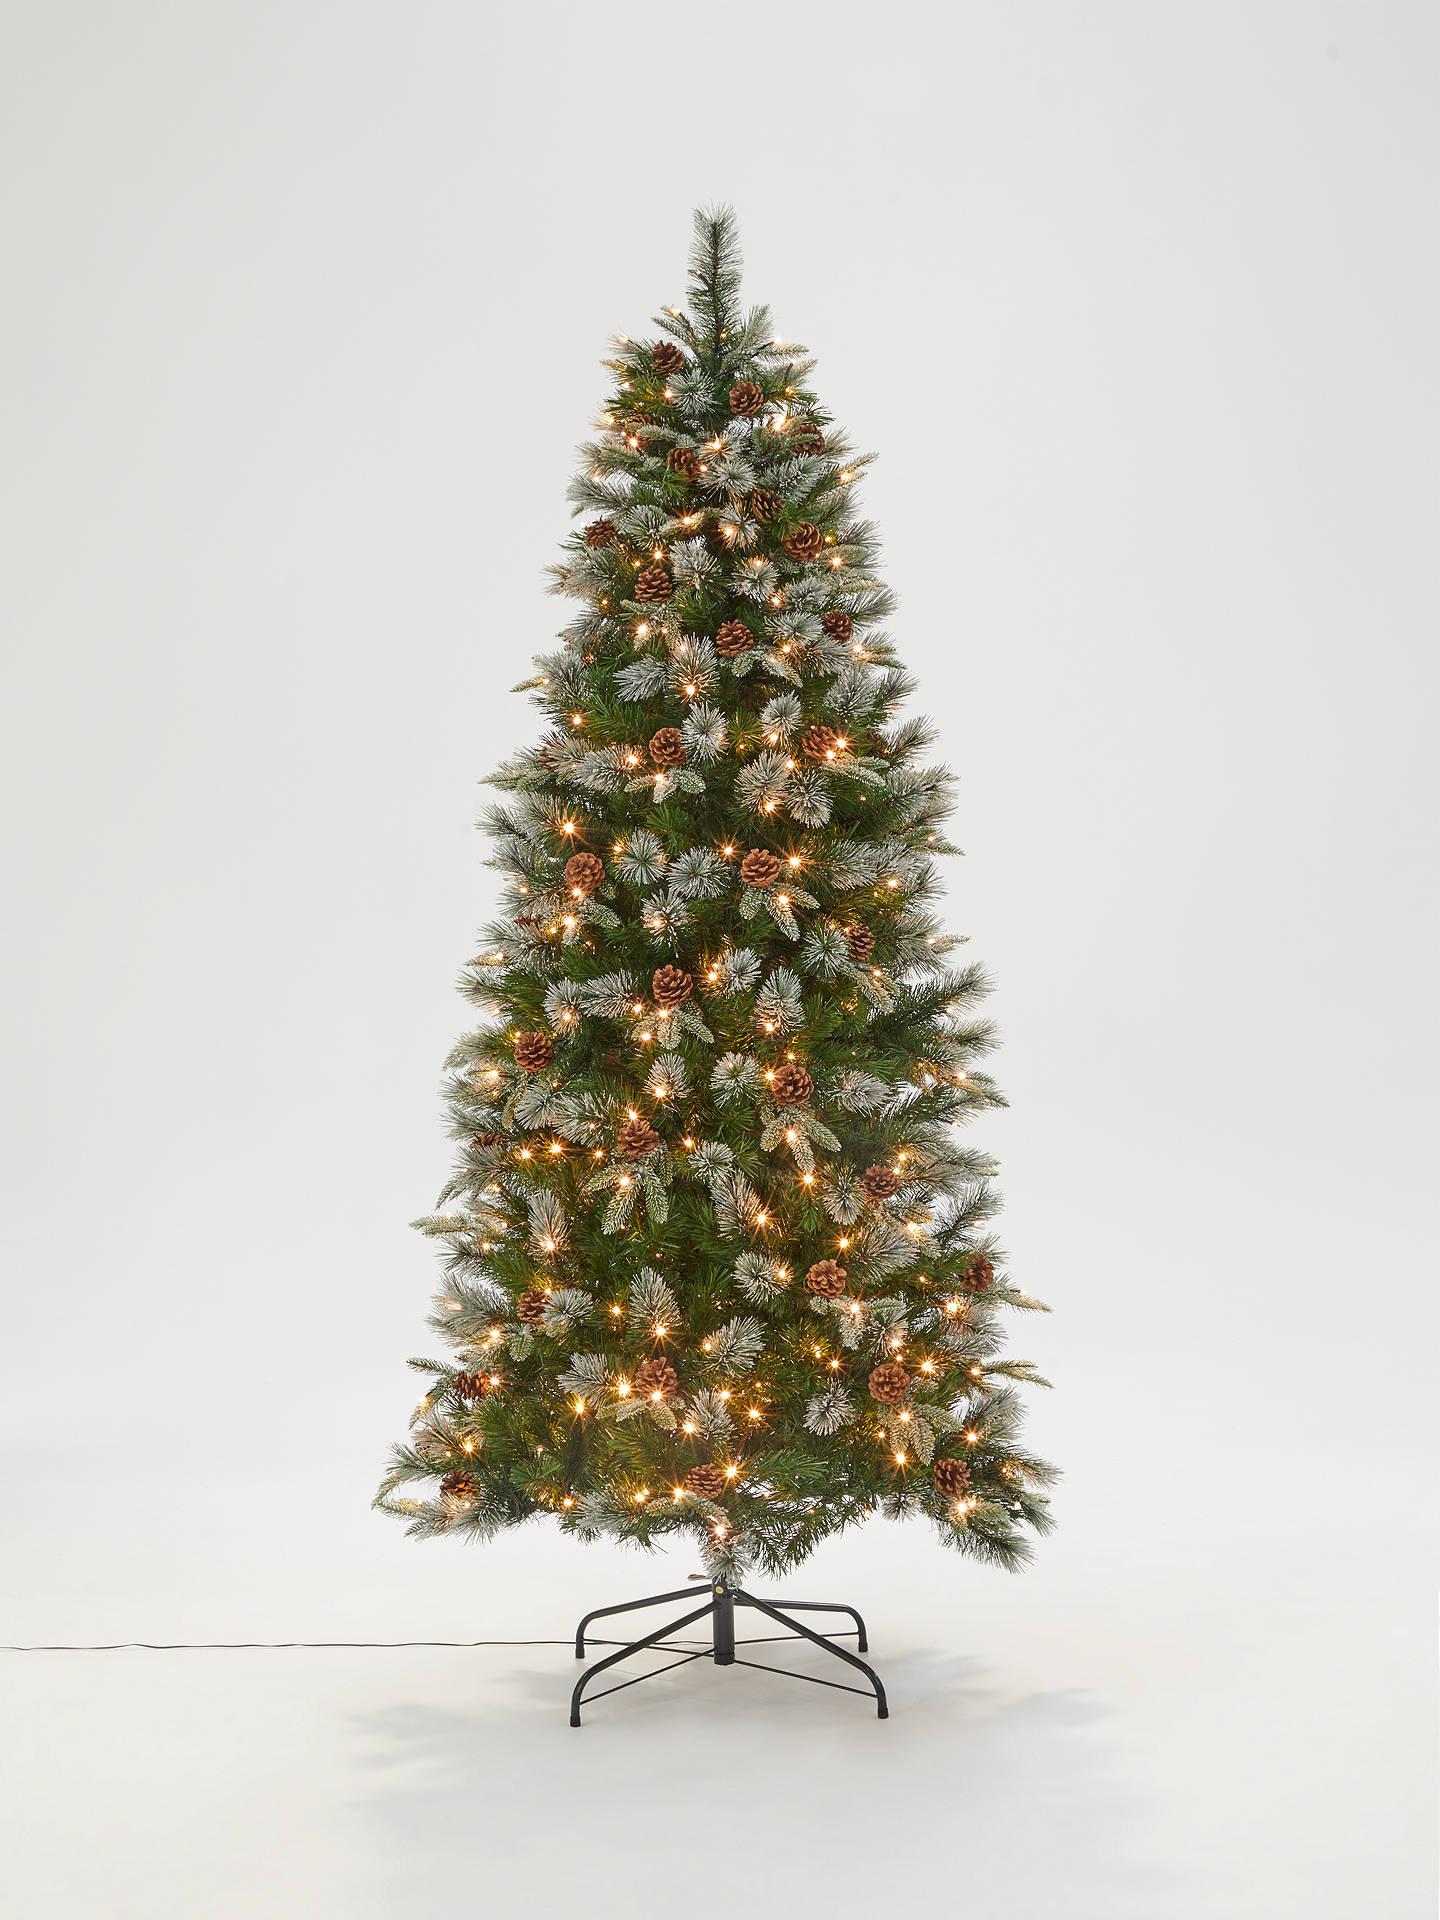 new arrival 40263 3b7a8 John Lewis & Partners Foxtail Pine Pre-lit Christmas Tree, 6.5ft